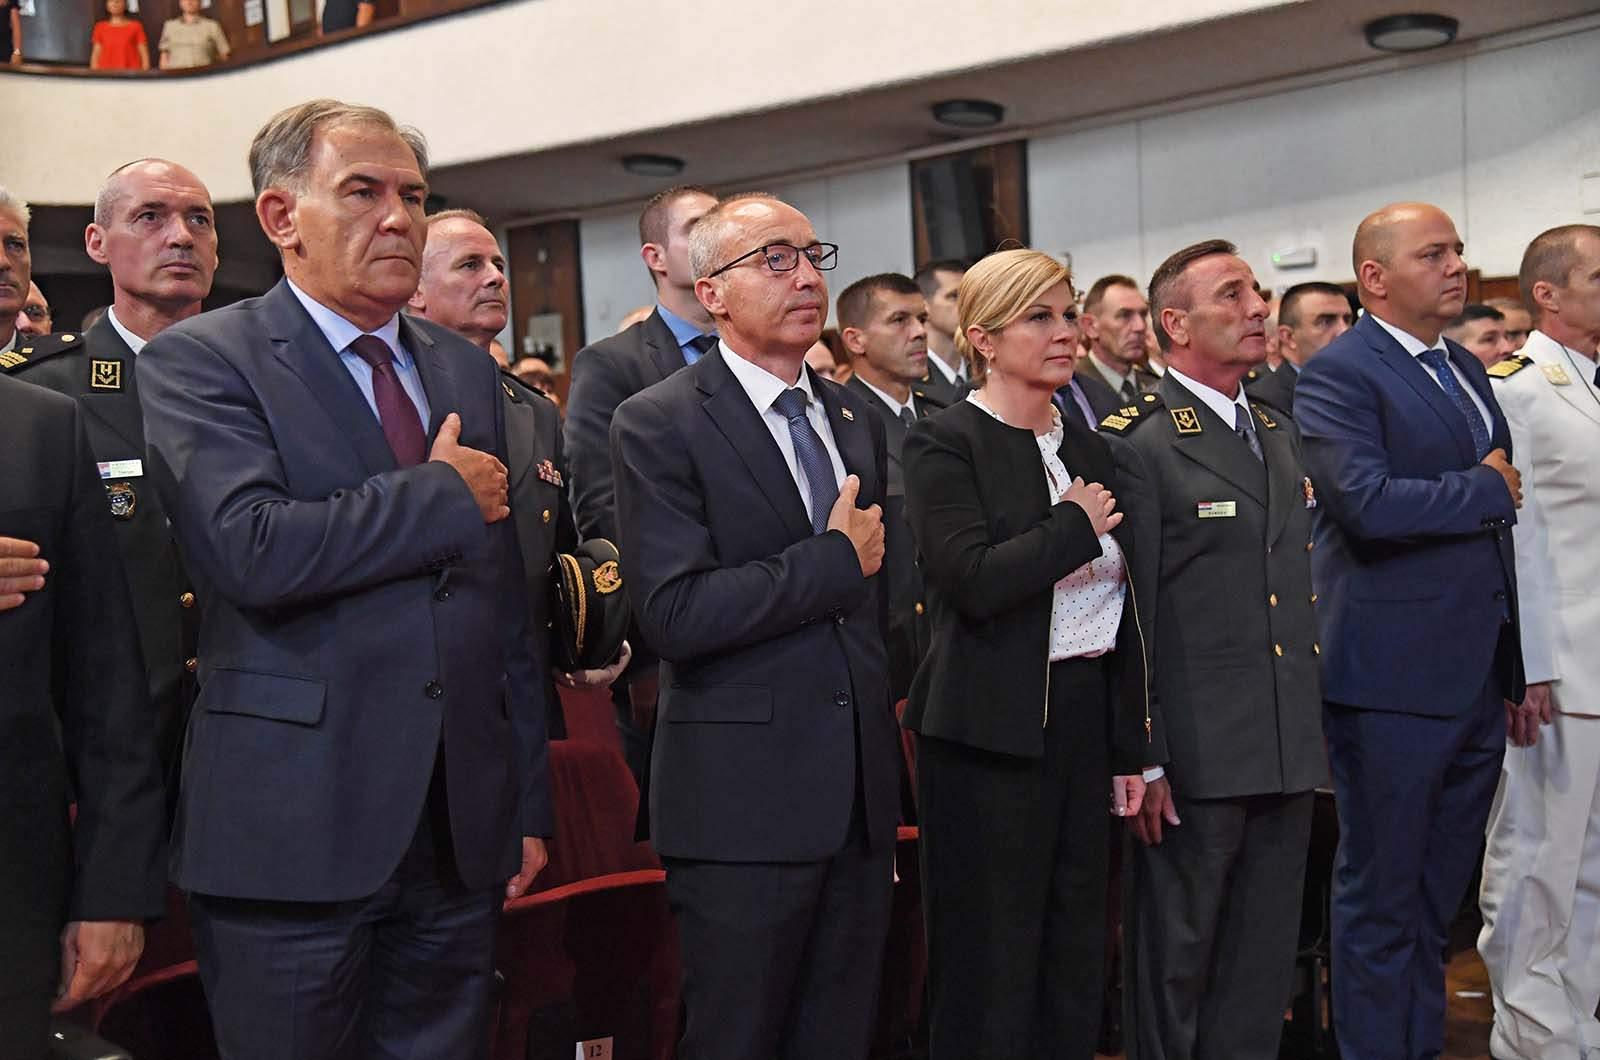 Svečana akademija povodom 24. obljetnice VRO Oluja – Grabar-Kitarović: 'Oluja' je spasila Bosnu i Hercegovinu